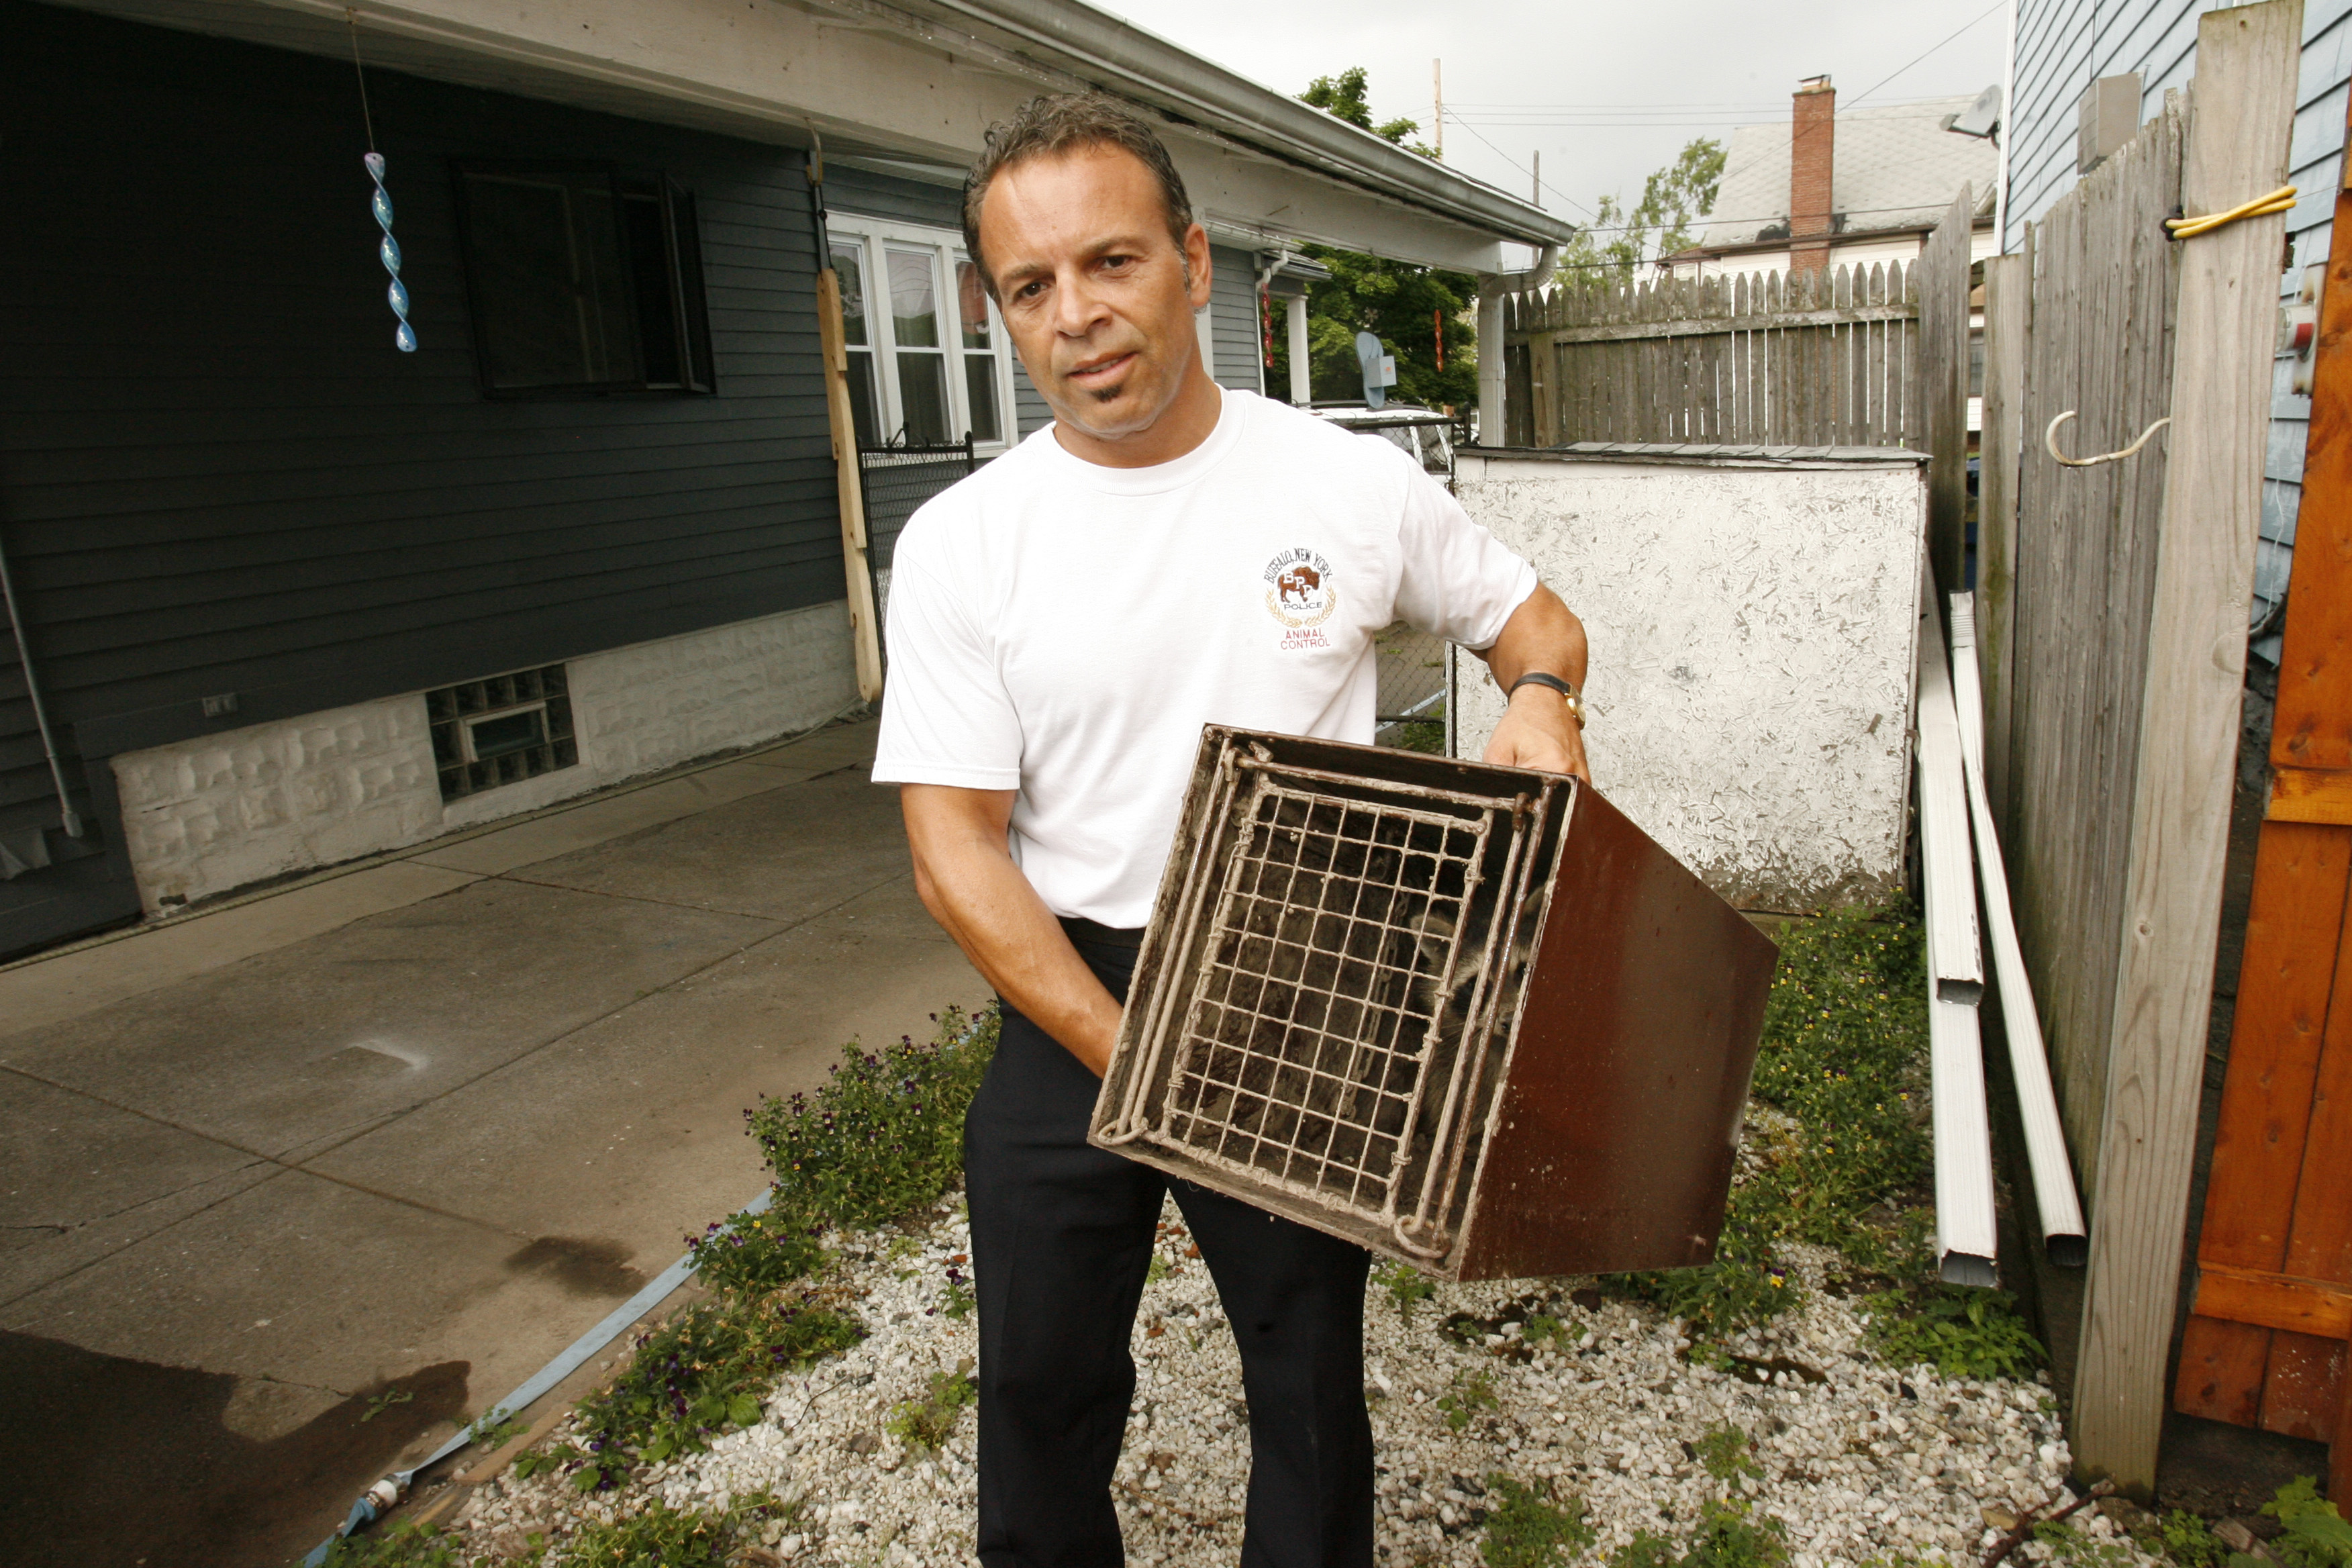 Robert Licata, in 2007, while working as city exterminator. (Buffalo News/ James McCoy )